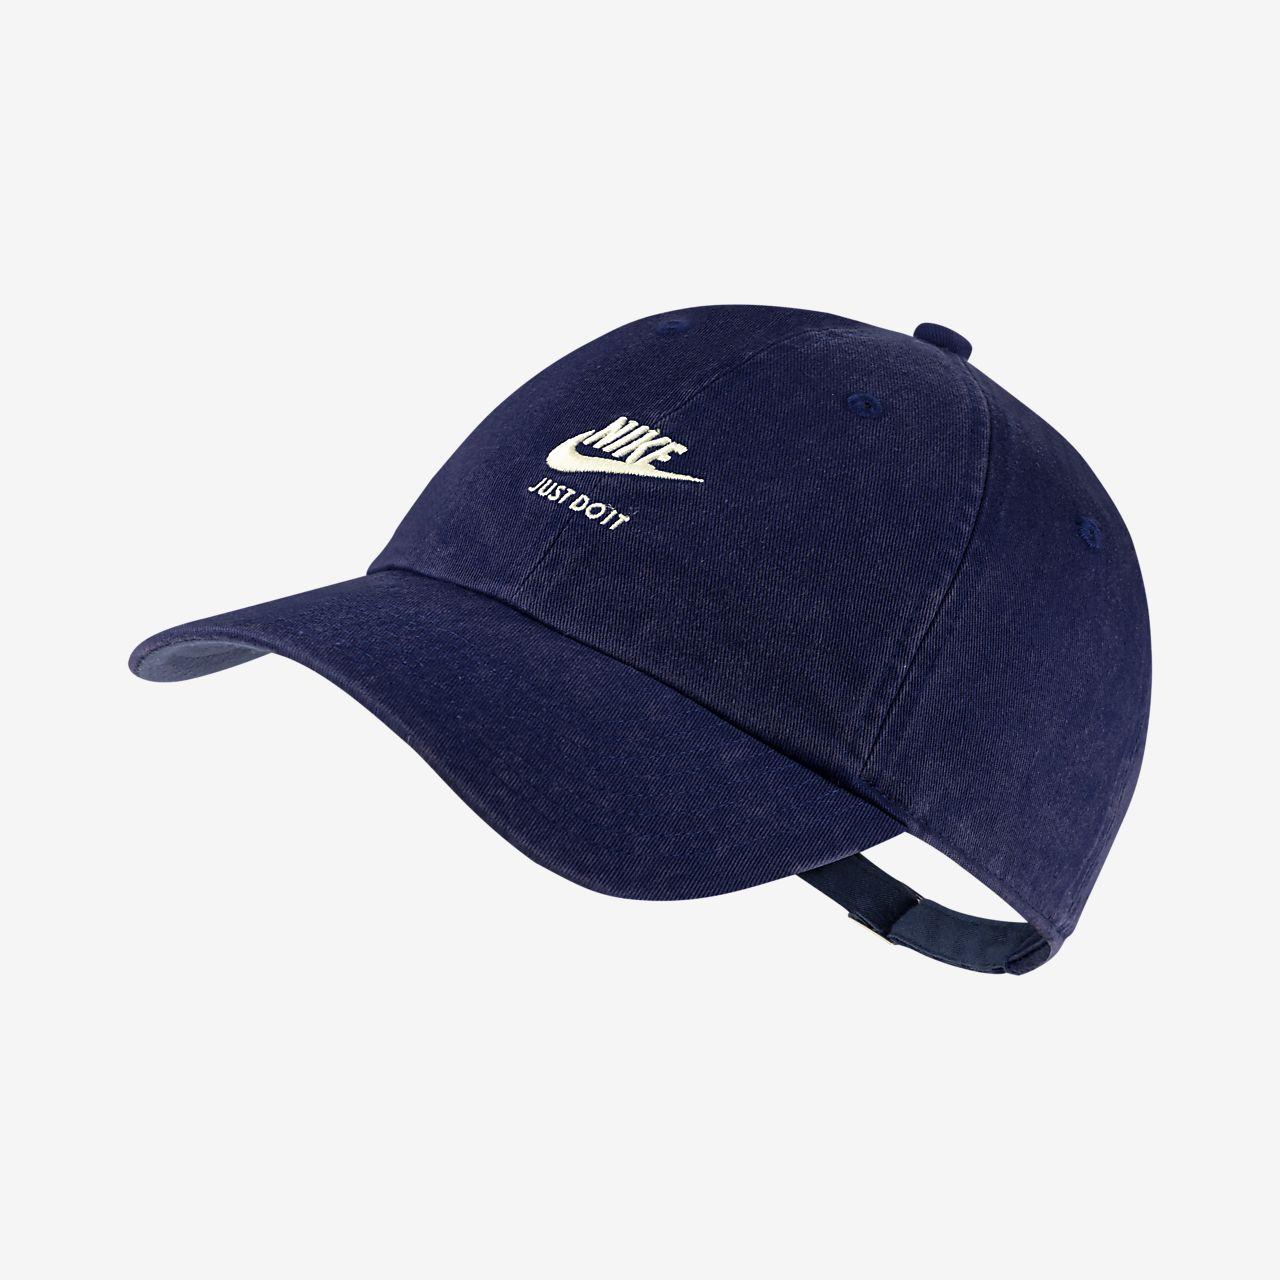 ed6e4610b3c1e Nike Sportswear Heritage 86 Adjustable Hat. Nike.com CH